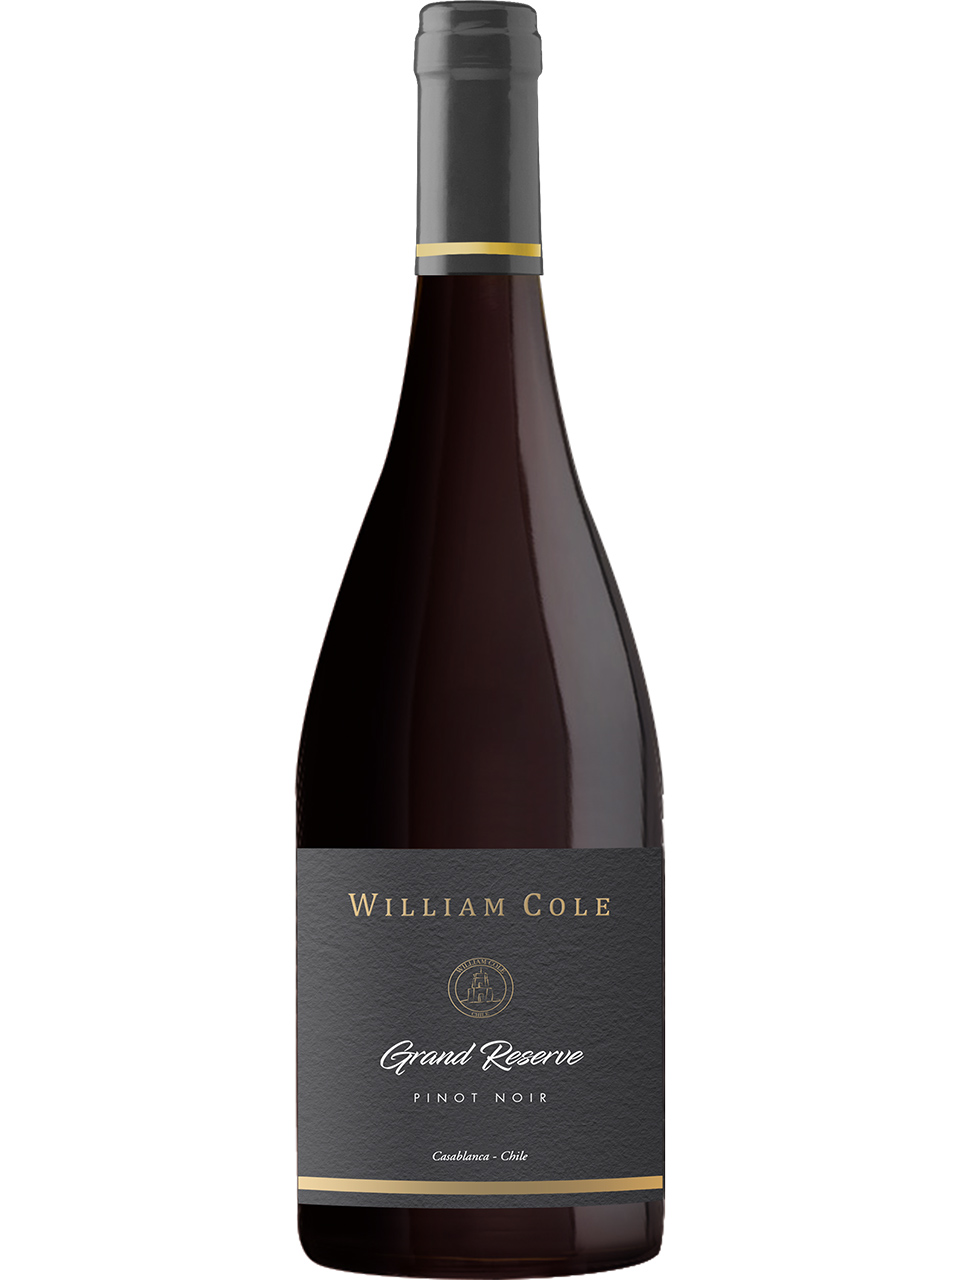 William Cole Grand Reserve Pinot Noir